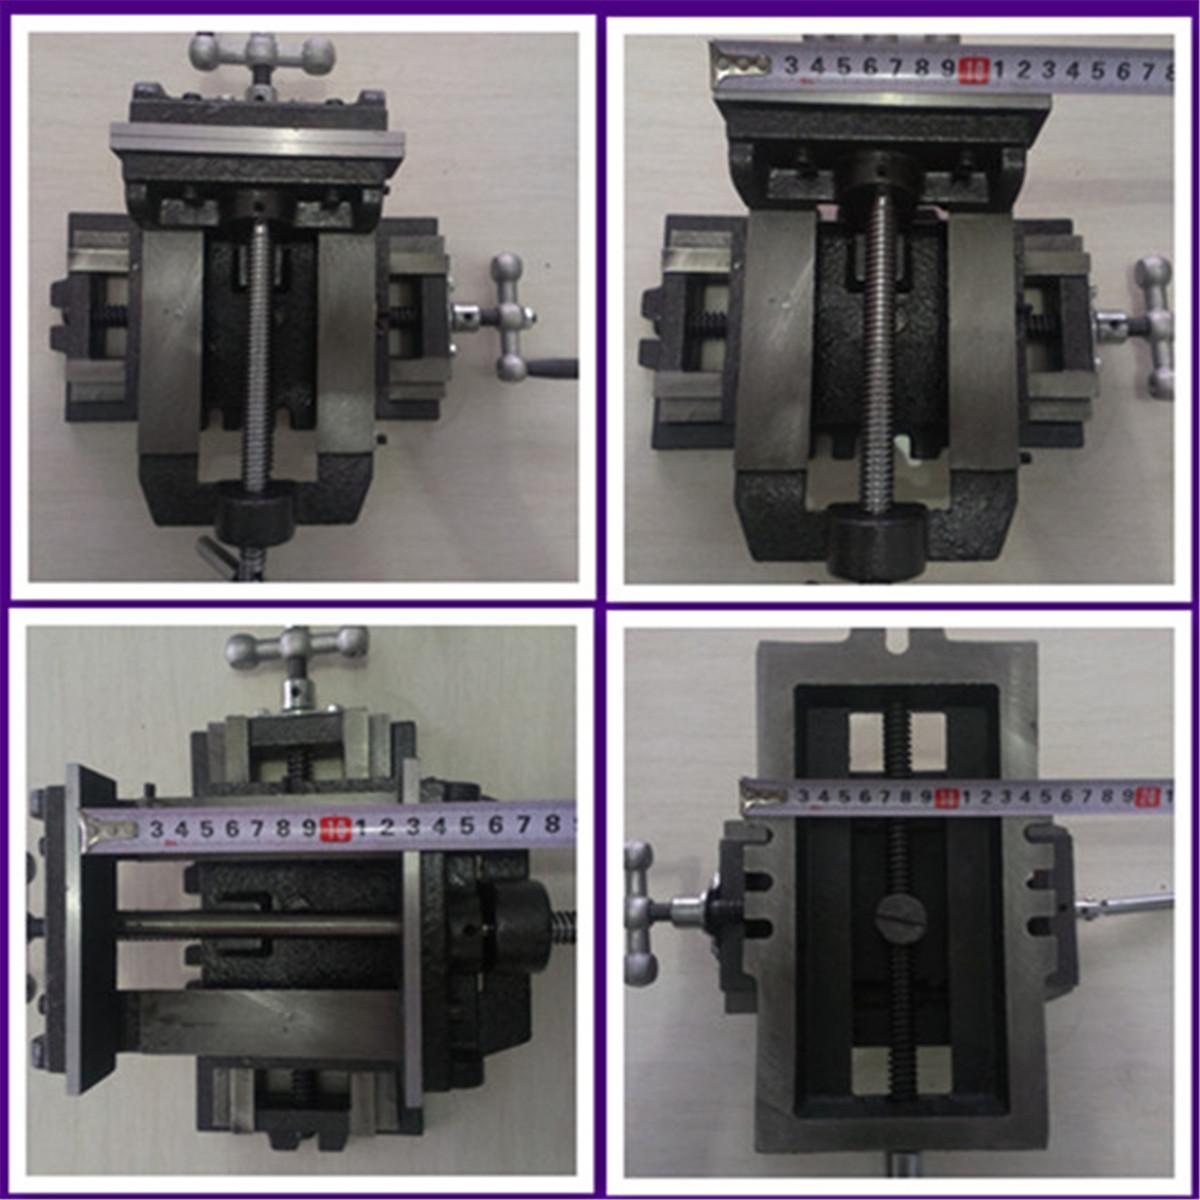 Vise vise vise drilling and milling machine drill cross clamp 3 Inch 4 inch 5 inch 6 inch 8 inch cross machine